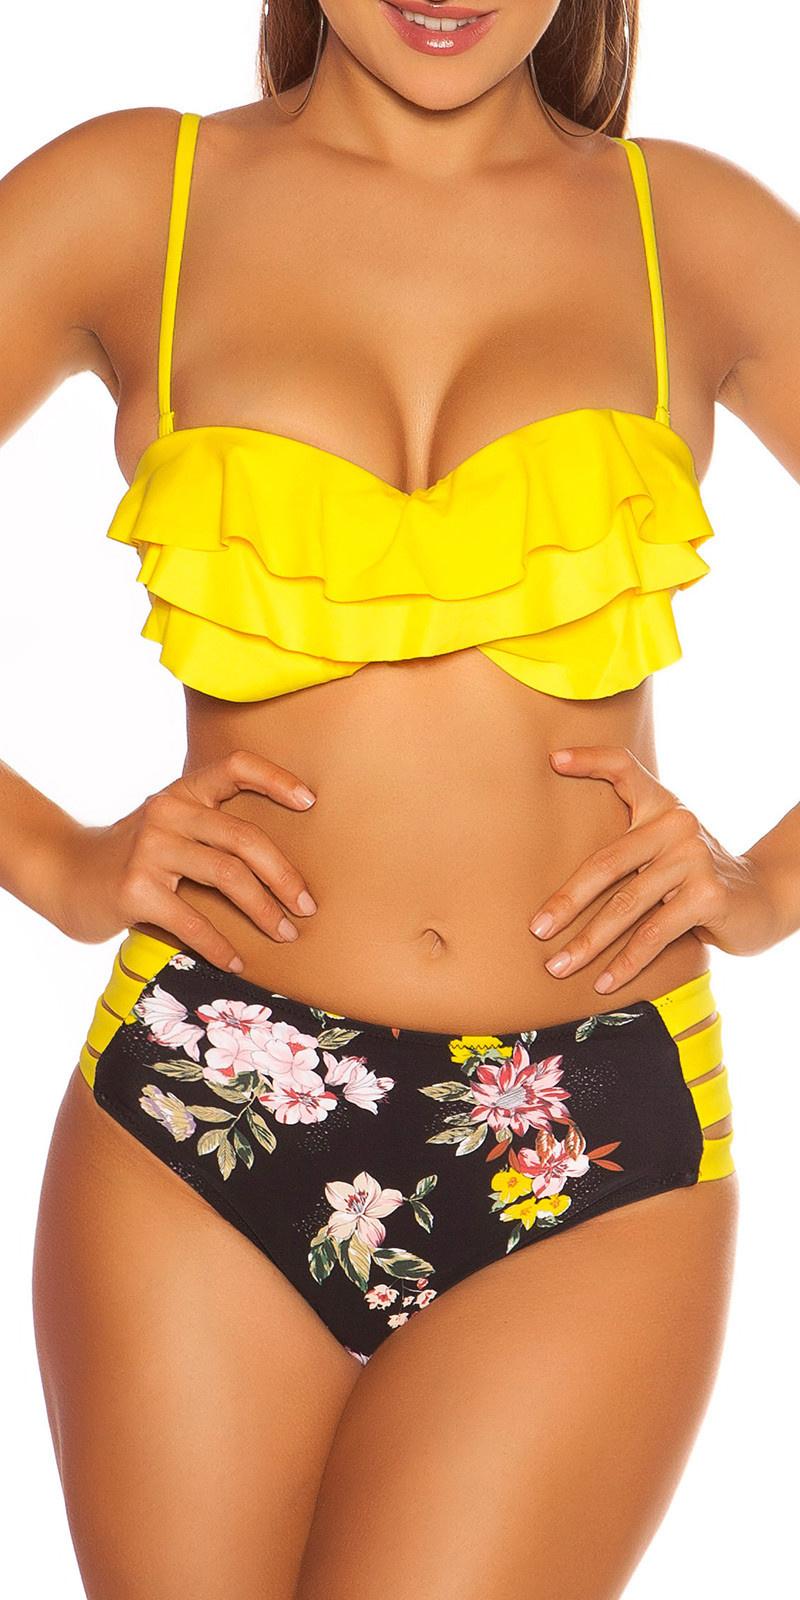 Sexy pushup-bikini met bloemenprint + hoge taille broek geel